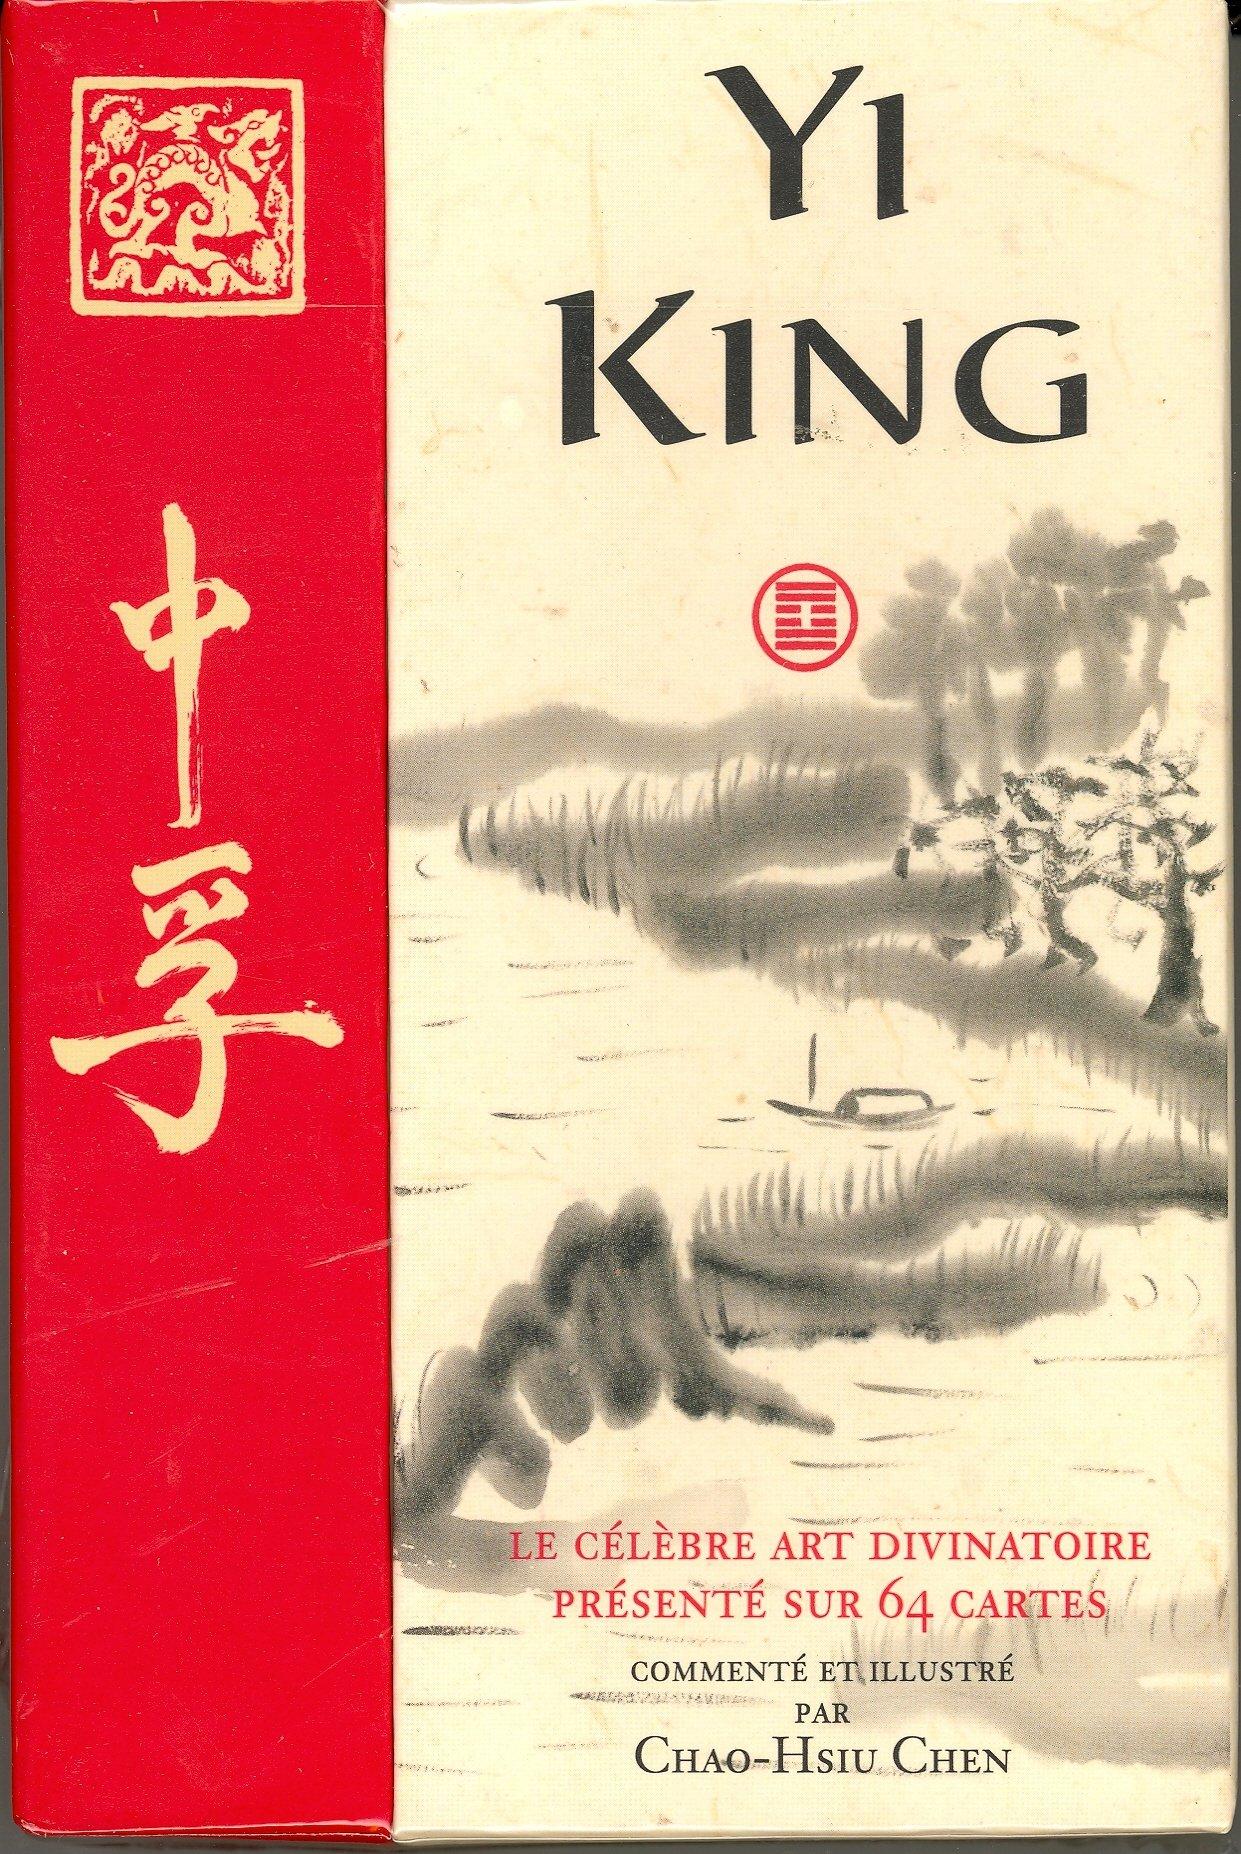 Amazon.fr - Yi King - Chen, Chao-Hsiu, Cohen, Loïc - Livres